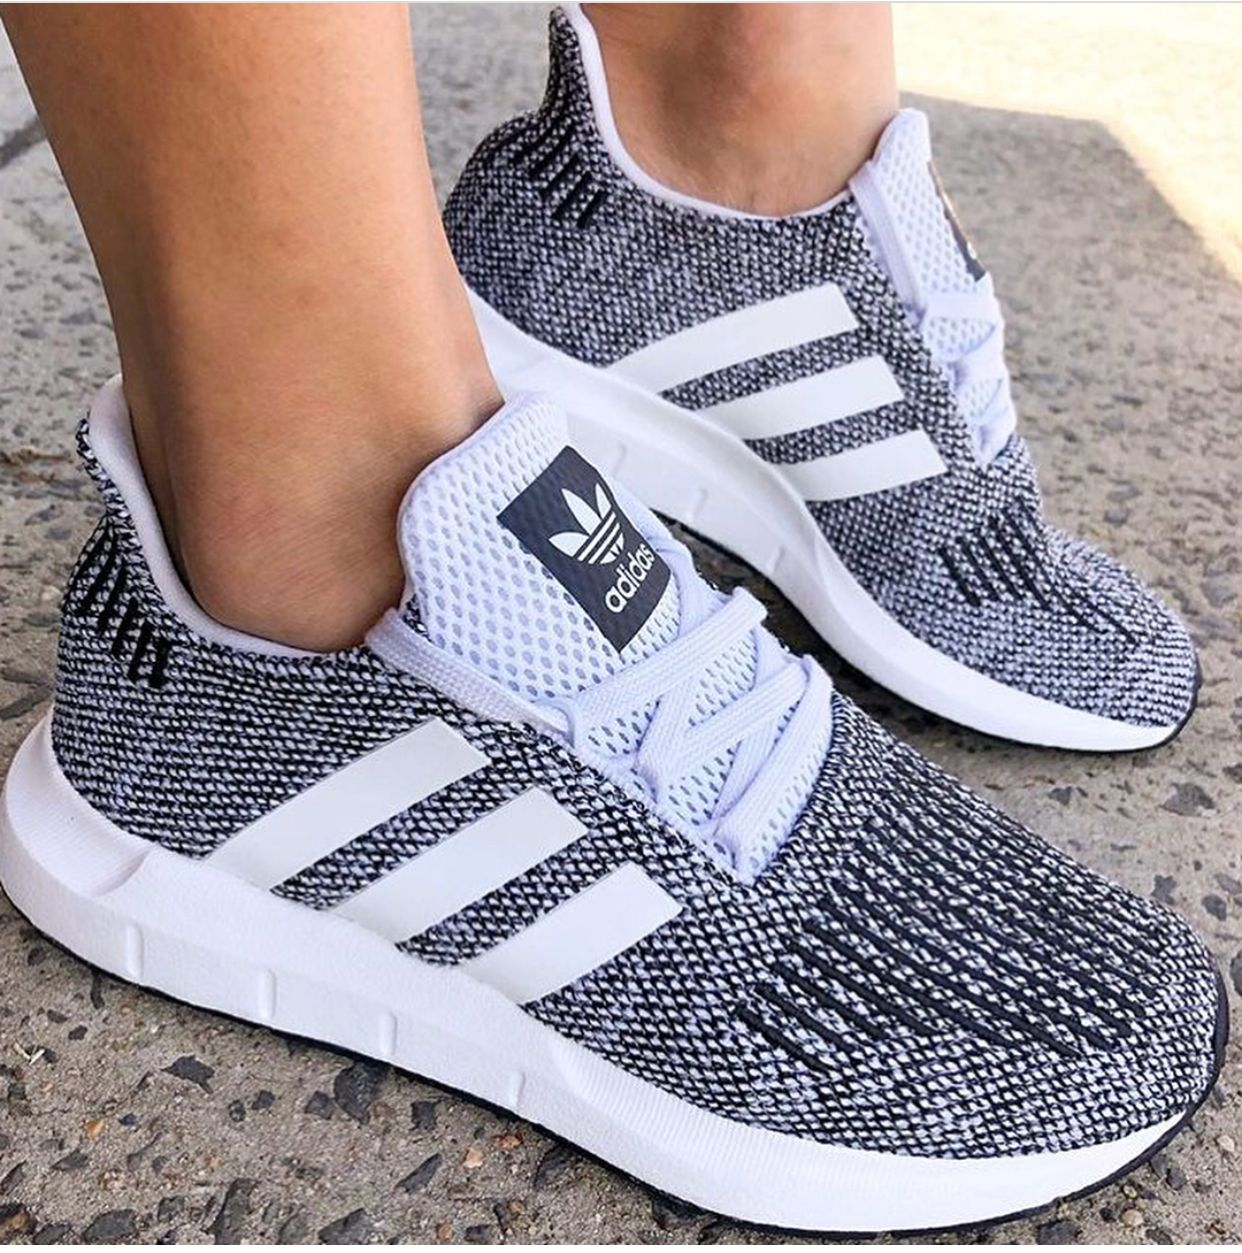 Adidas kicks | Adidas schoenen, Schoenen, Schoenen sneakers